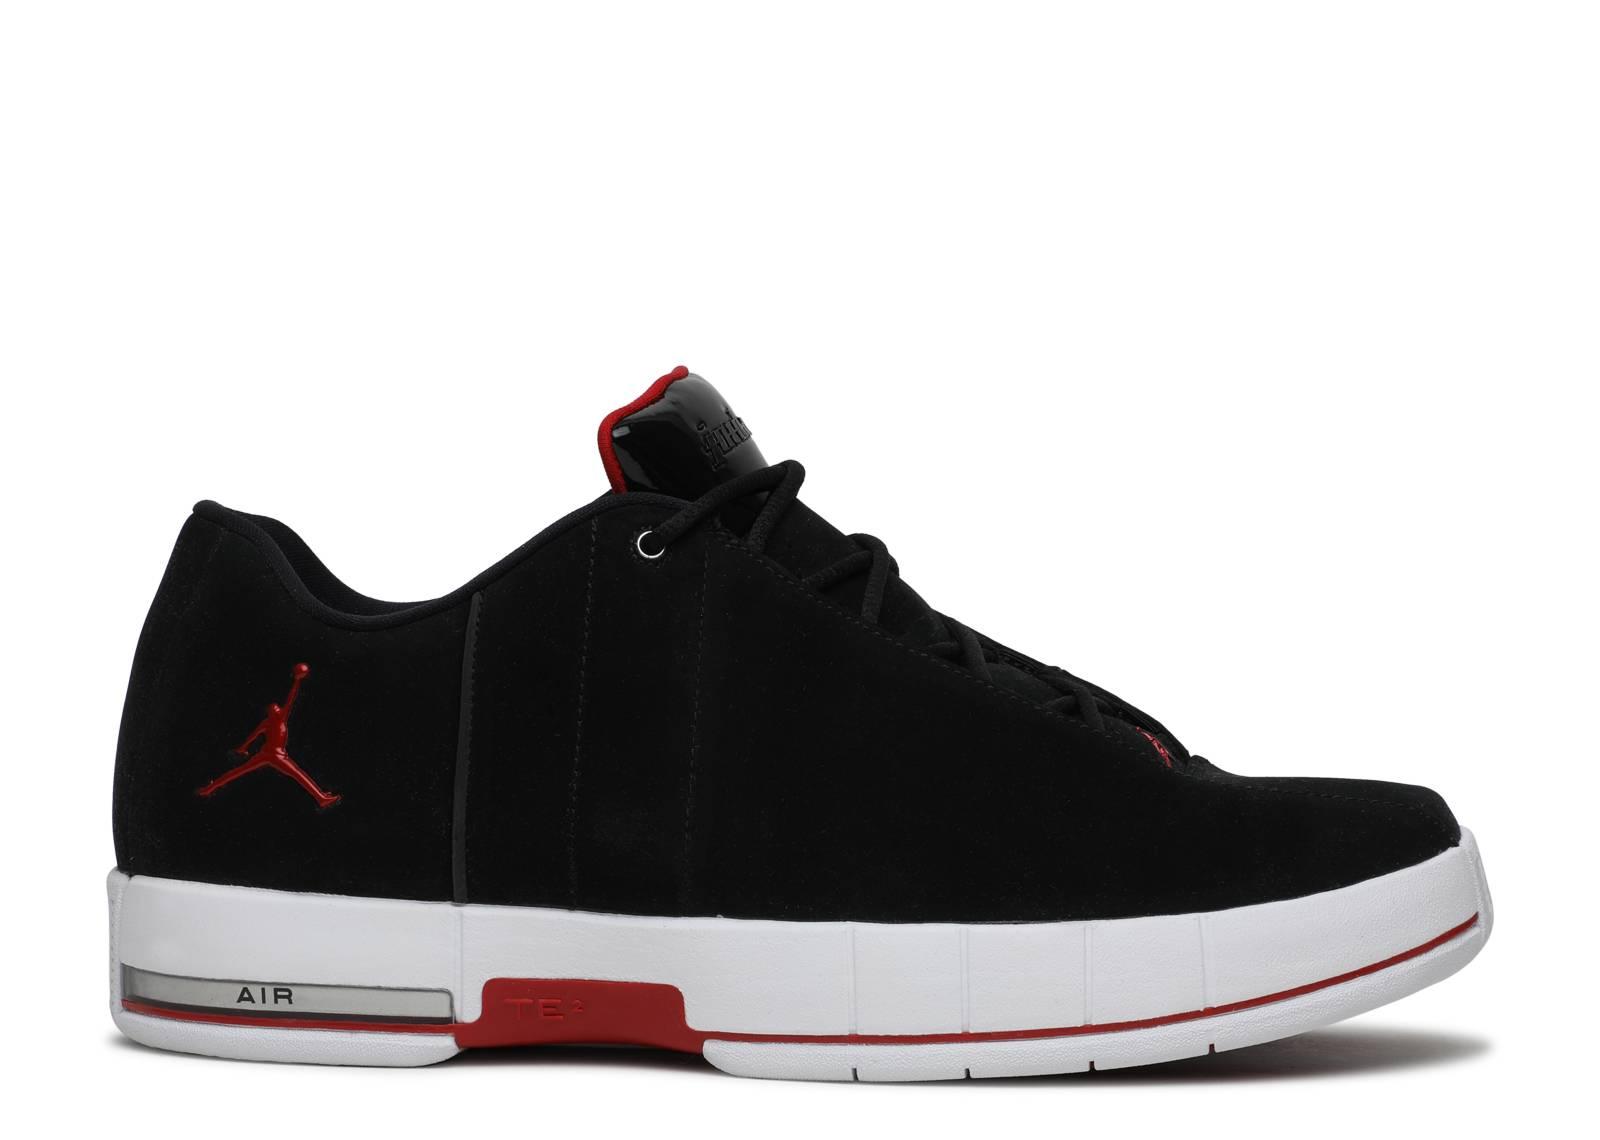 0efba58acda ... Nike Free Hyperfeel Tr White. jordans te 2 size 6.5. jordans te 2 size  6.5